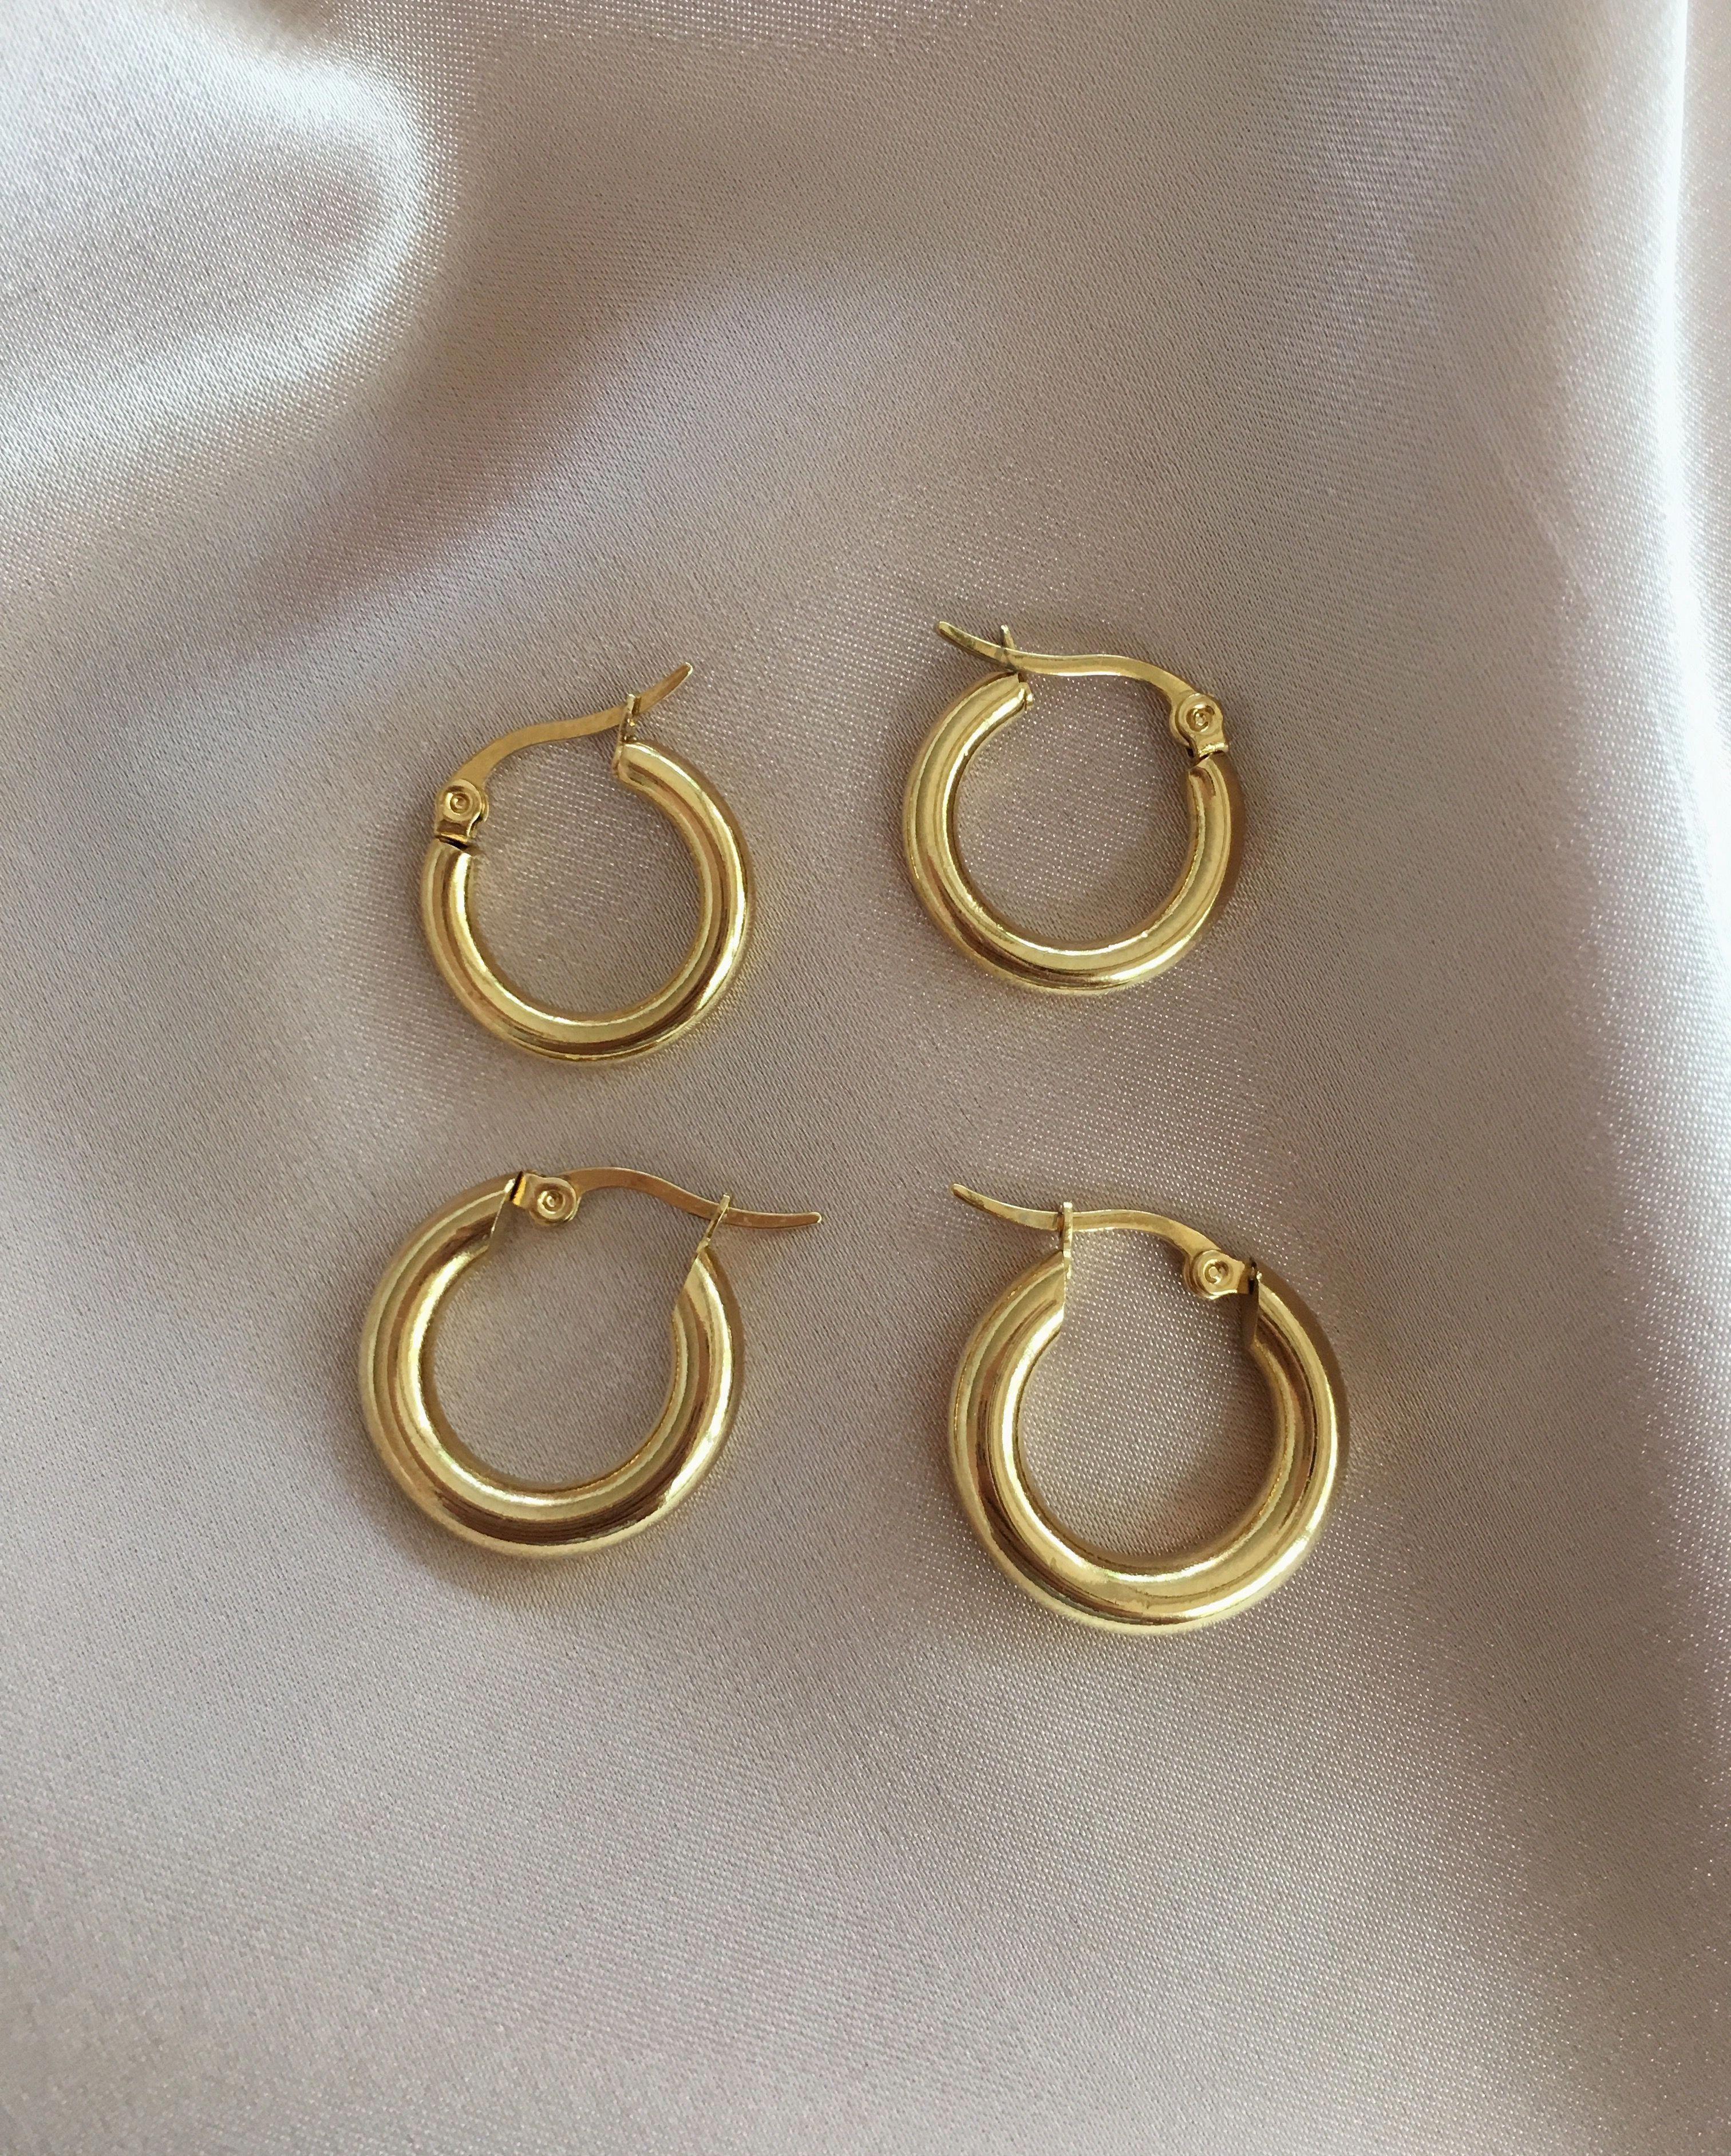 UNIQUE Lightweight Artisanal Urban Gold Rings Long Dangle Earrings